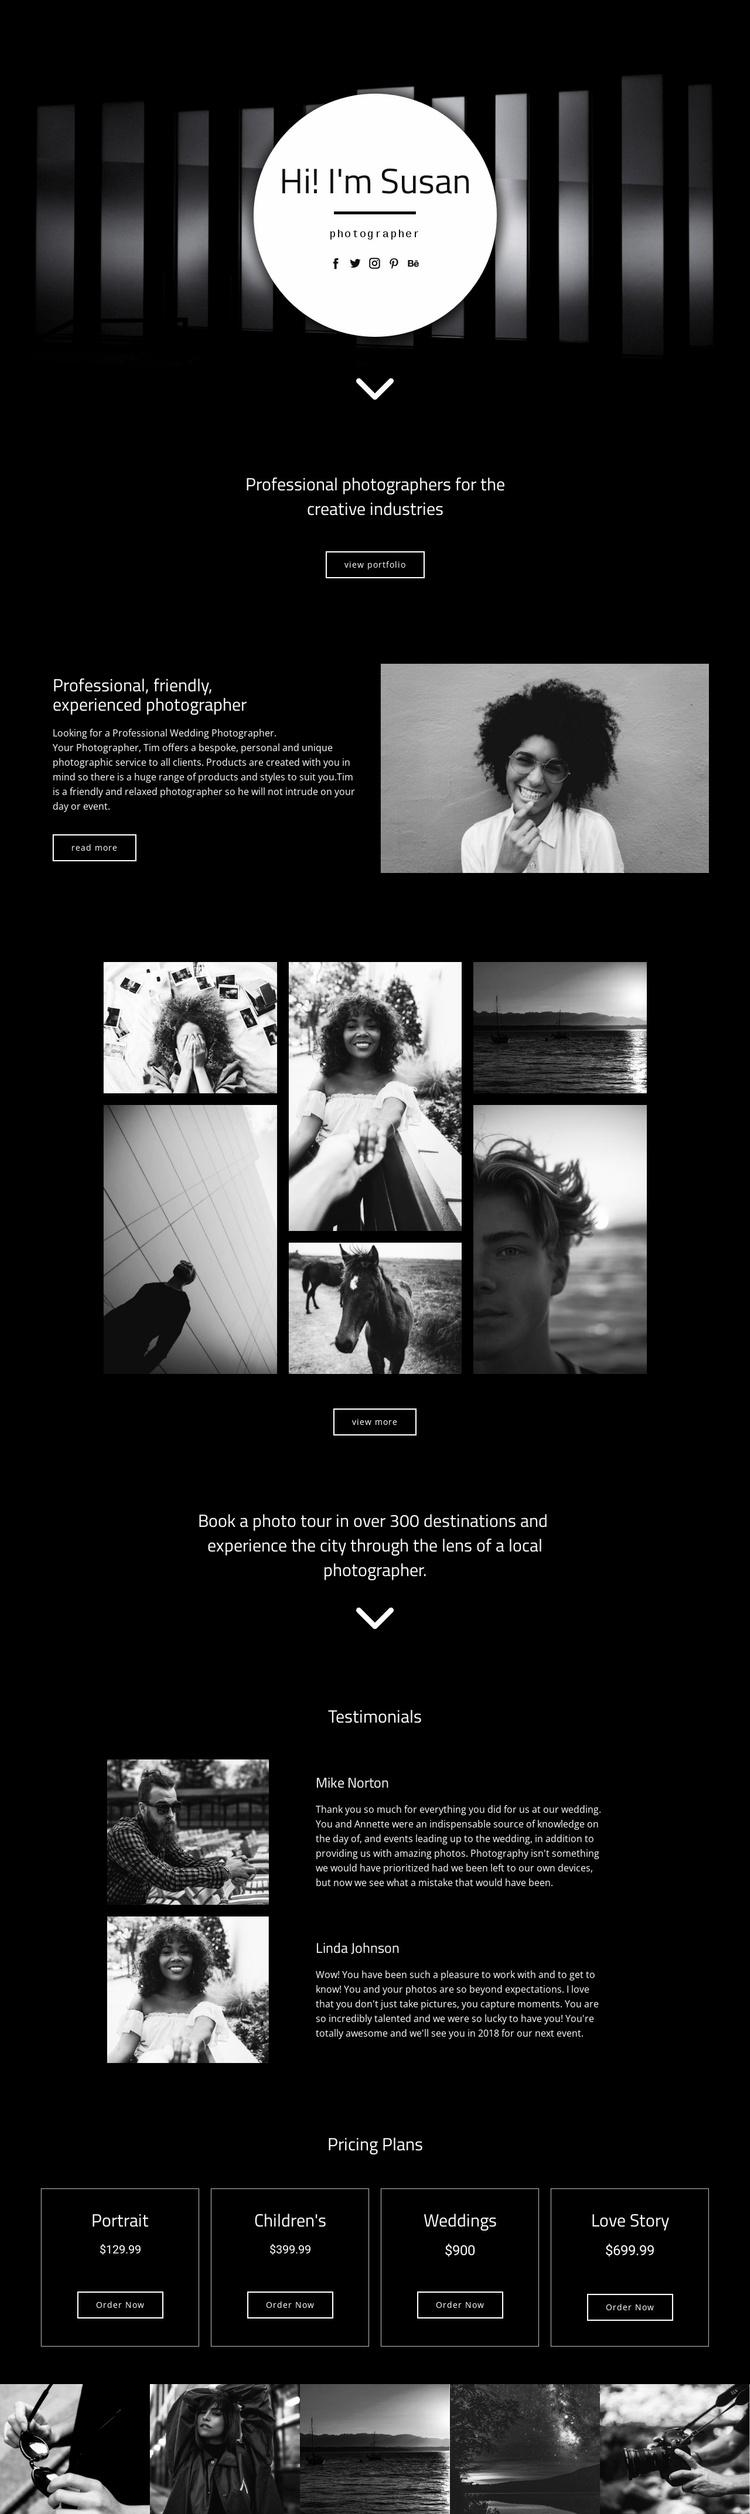 Your Photographer Website Template